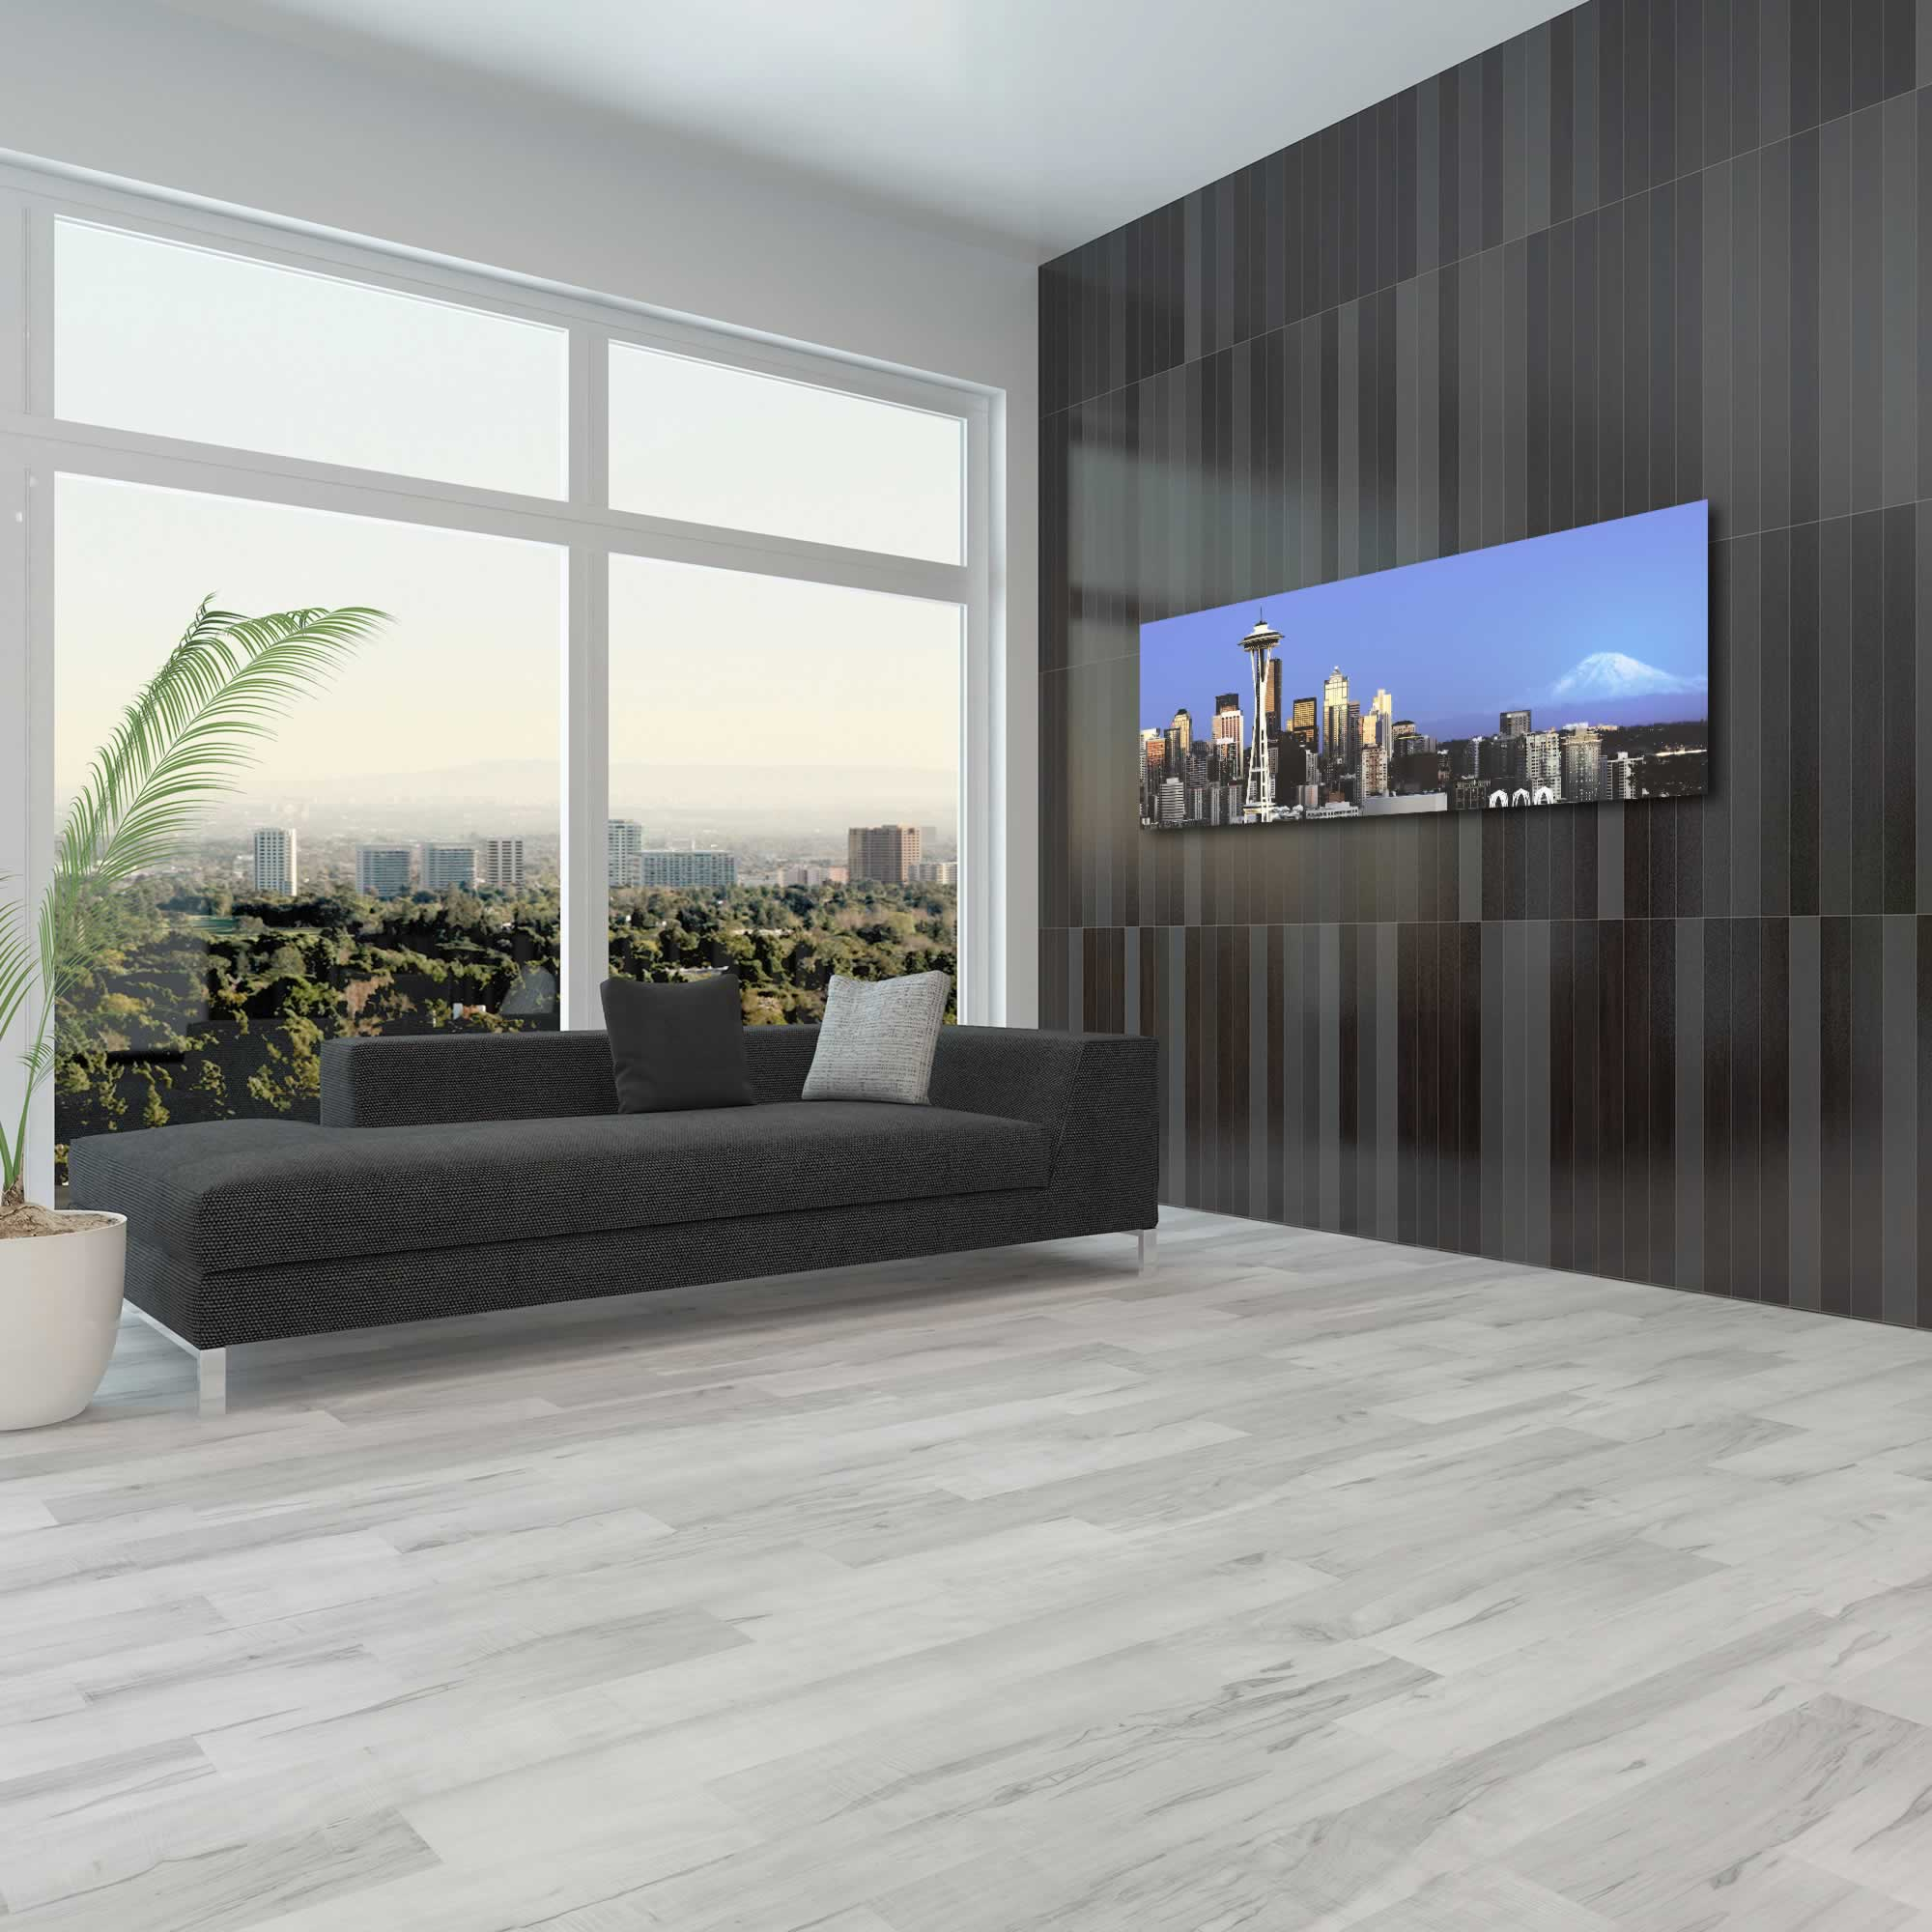 Seattle City Skyline - Urban Modern Art, Designer Home Decor, Cityscape Wall Artwork, Trendy Contemporary Art - Alternate View 3